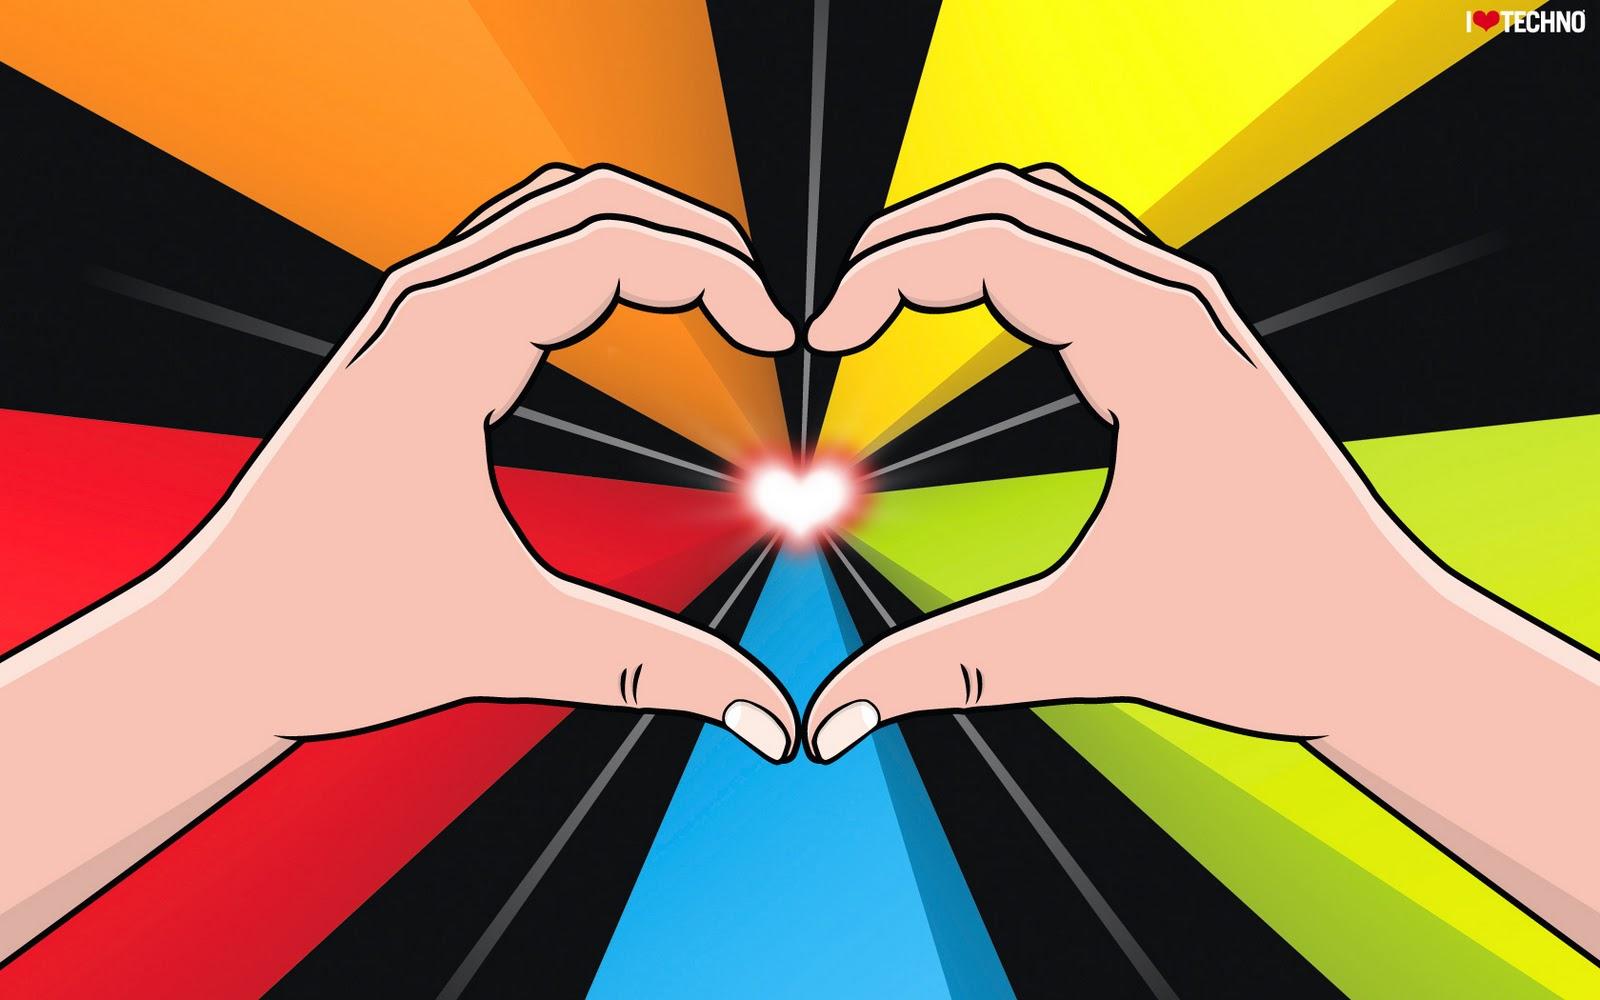 http://1.bp.blogspot.com/_R5XLL0huH0I/TOST5lJufYI/AAAAAAAAAZ8/aWHH1mMLqrU/s1600/I_Love_Techno_2010_Wallpaper.jpg